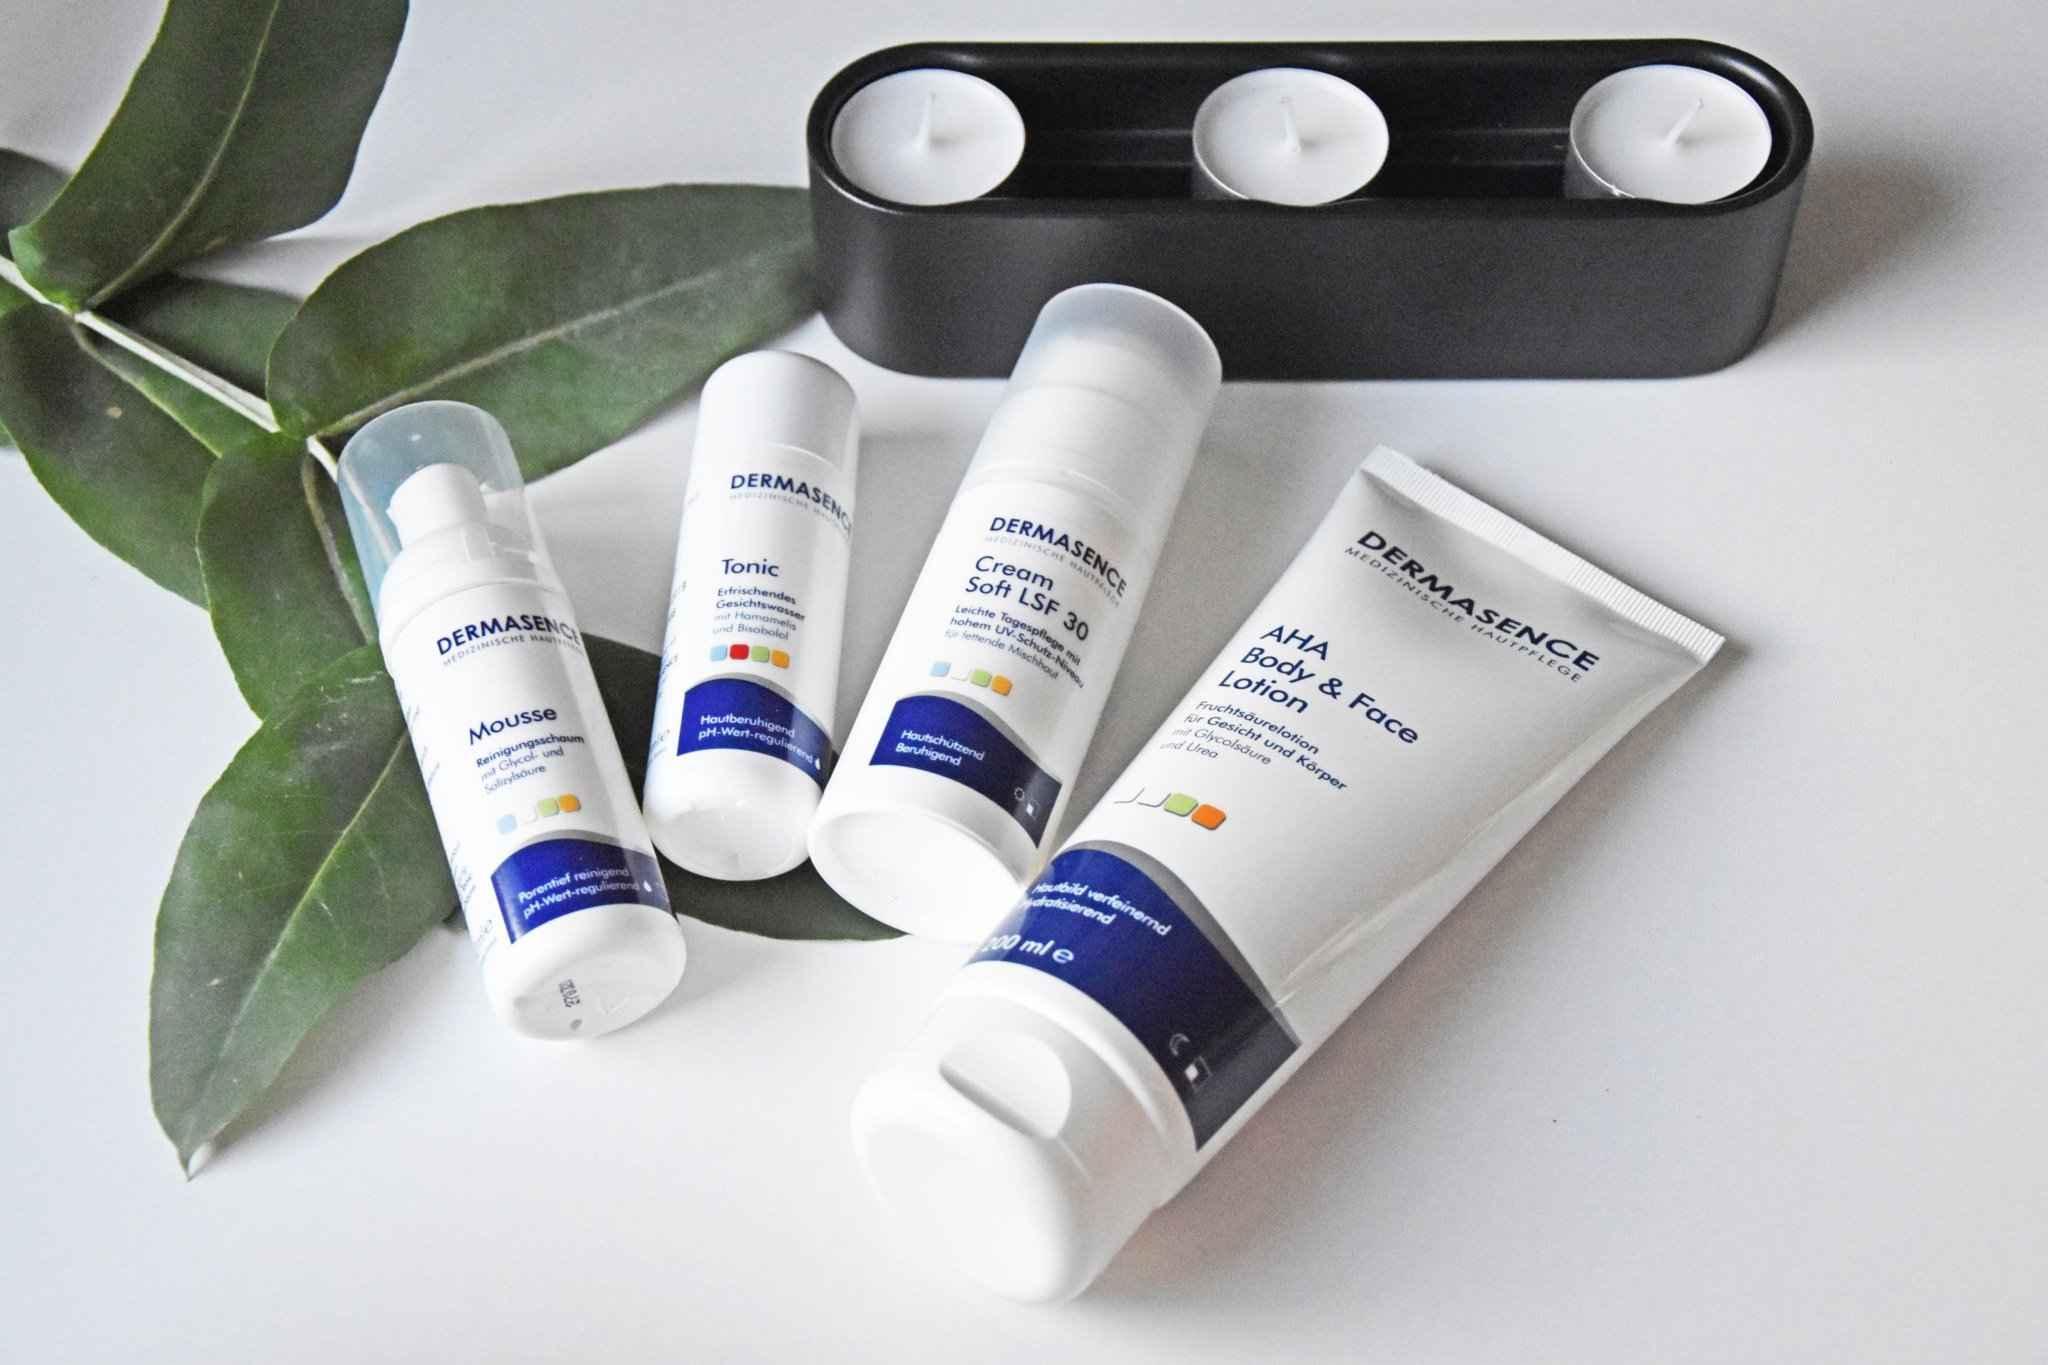 Dermasence - Mousse, Tonic,AHA Lotion &Cream Soft